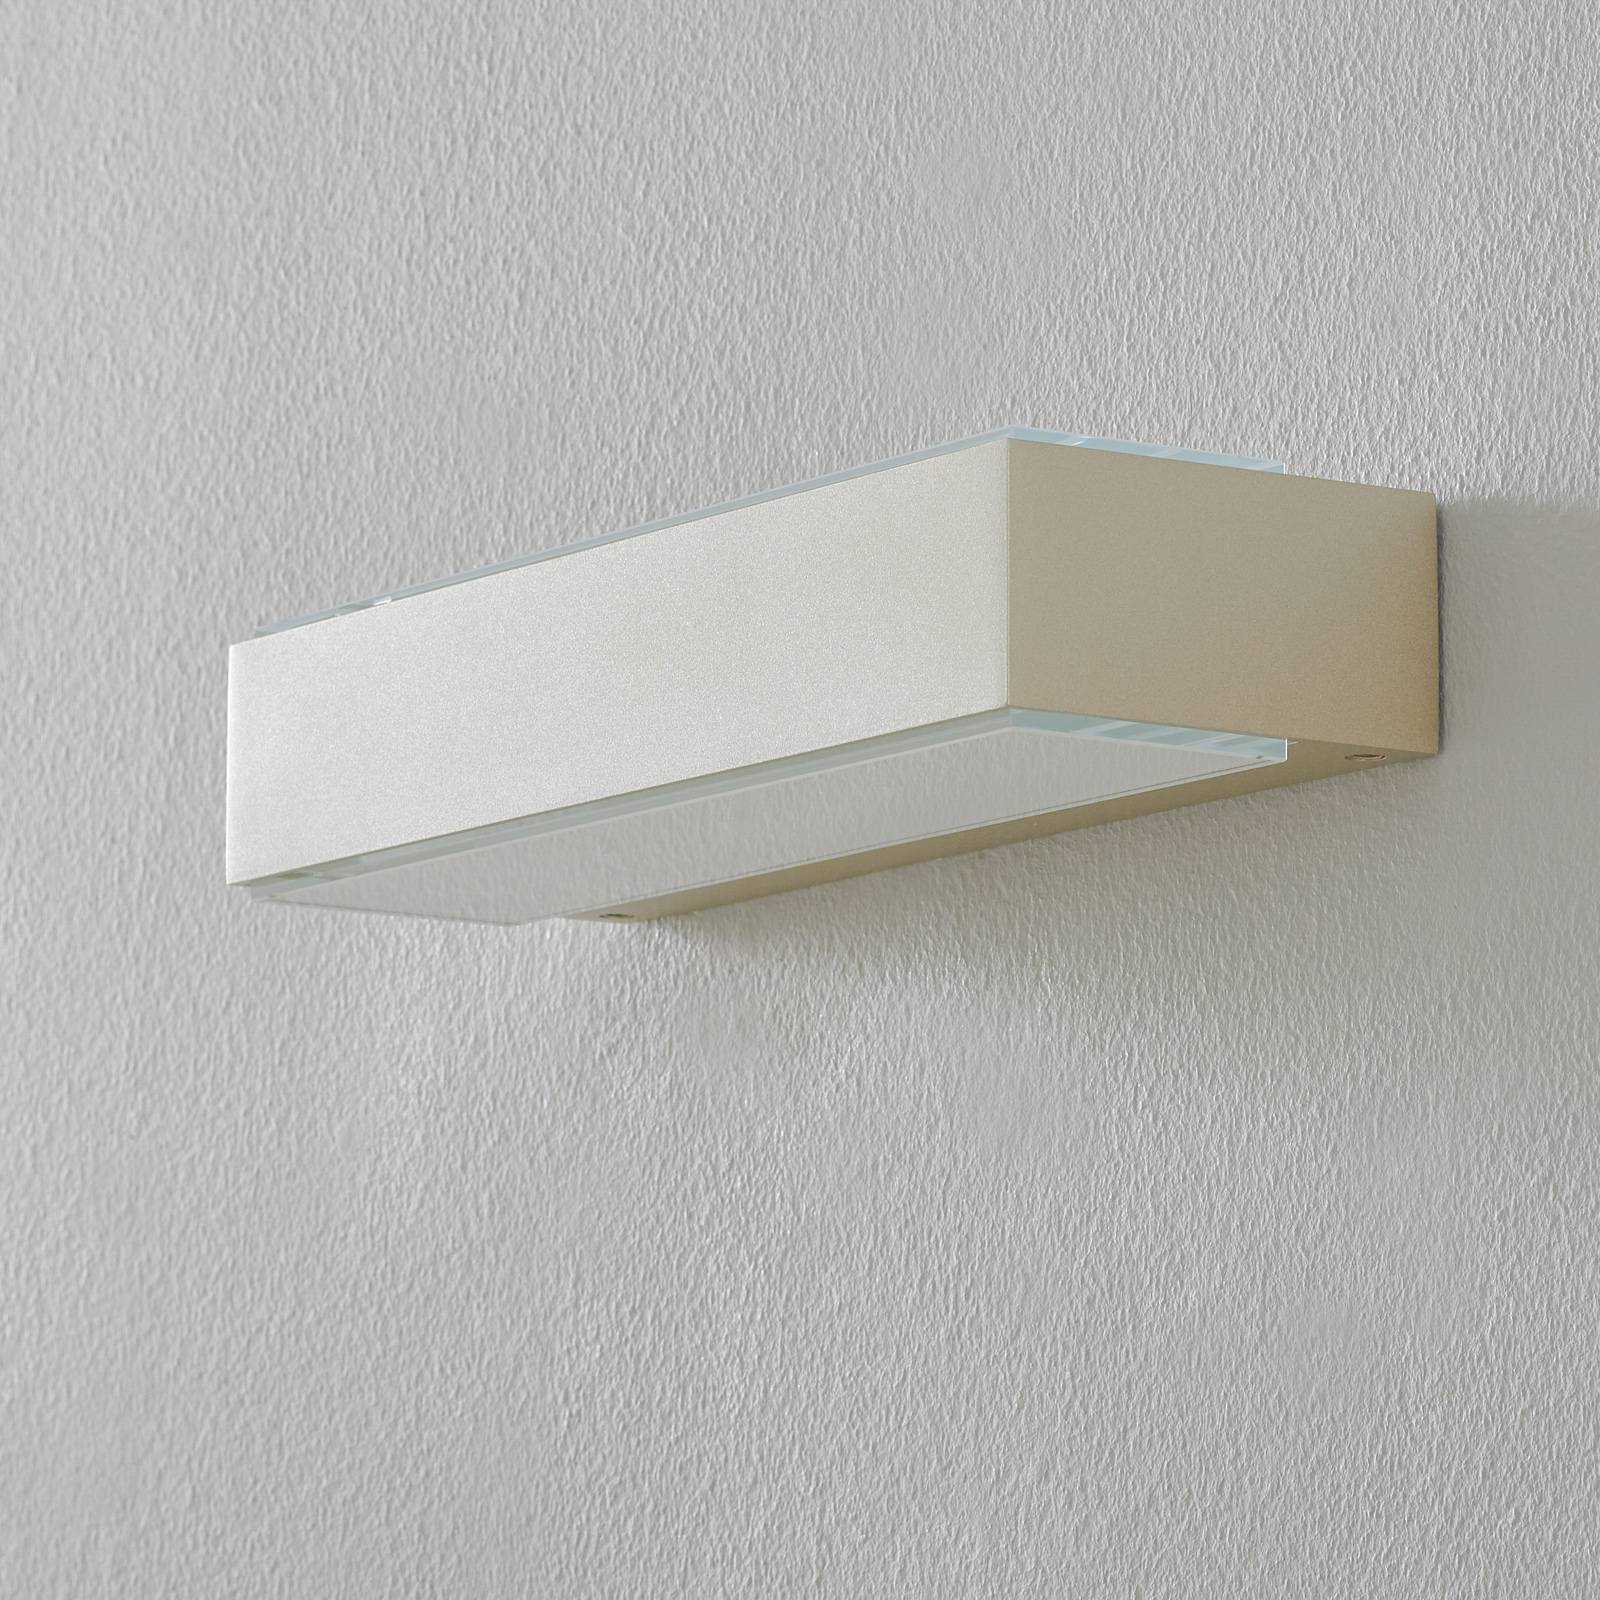 BEGA 12278 LED-seinävalaisin 3000K 30 cm palladium